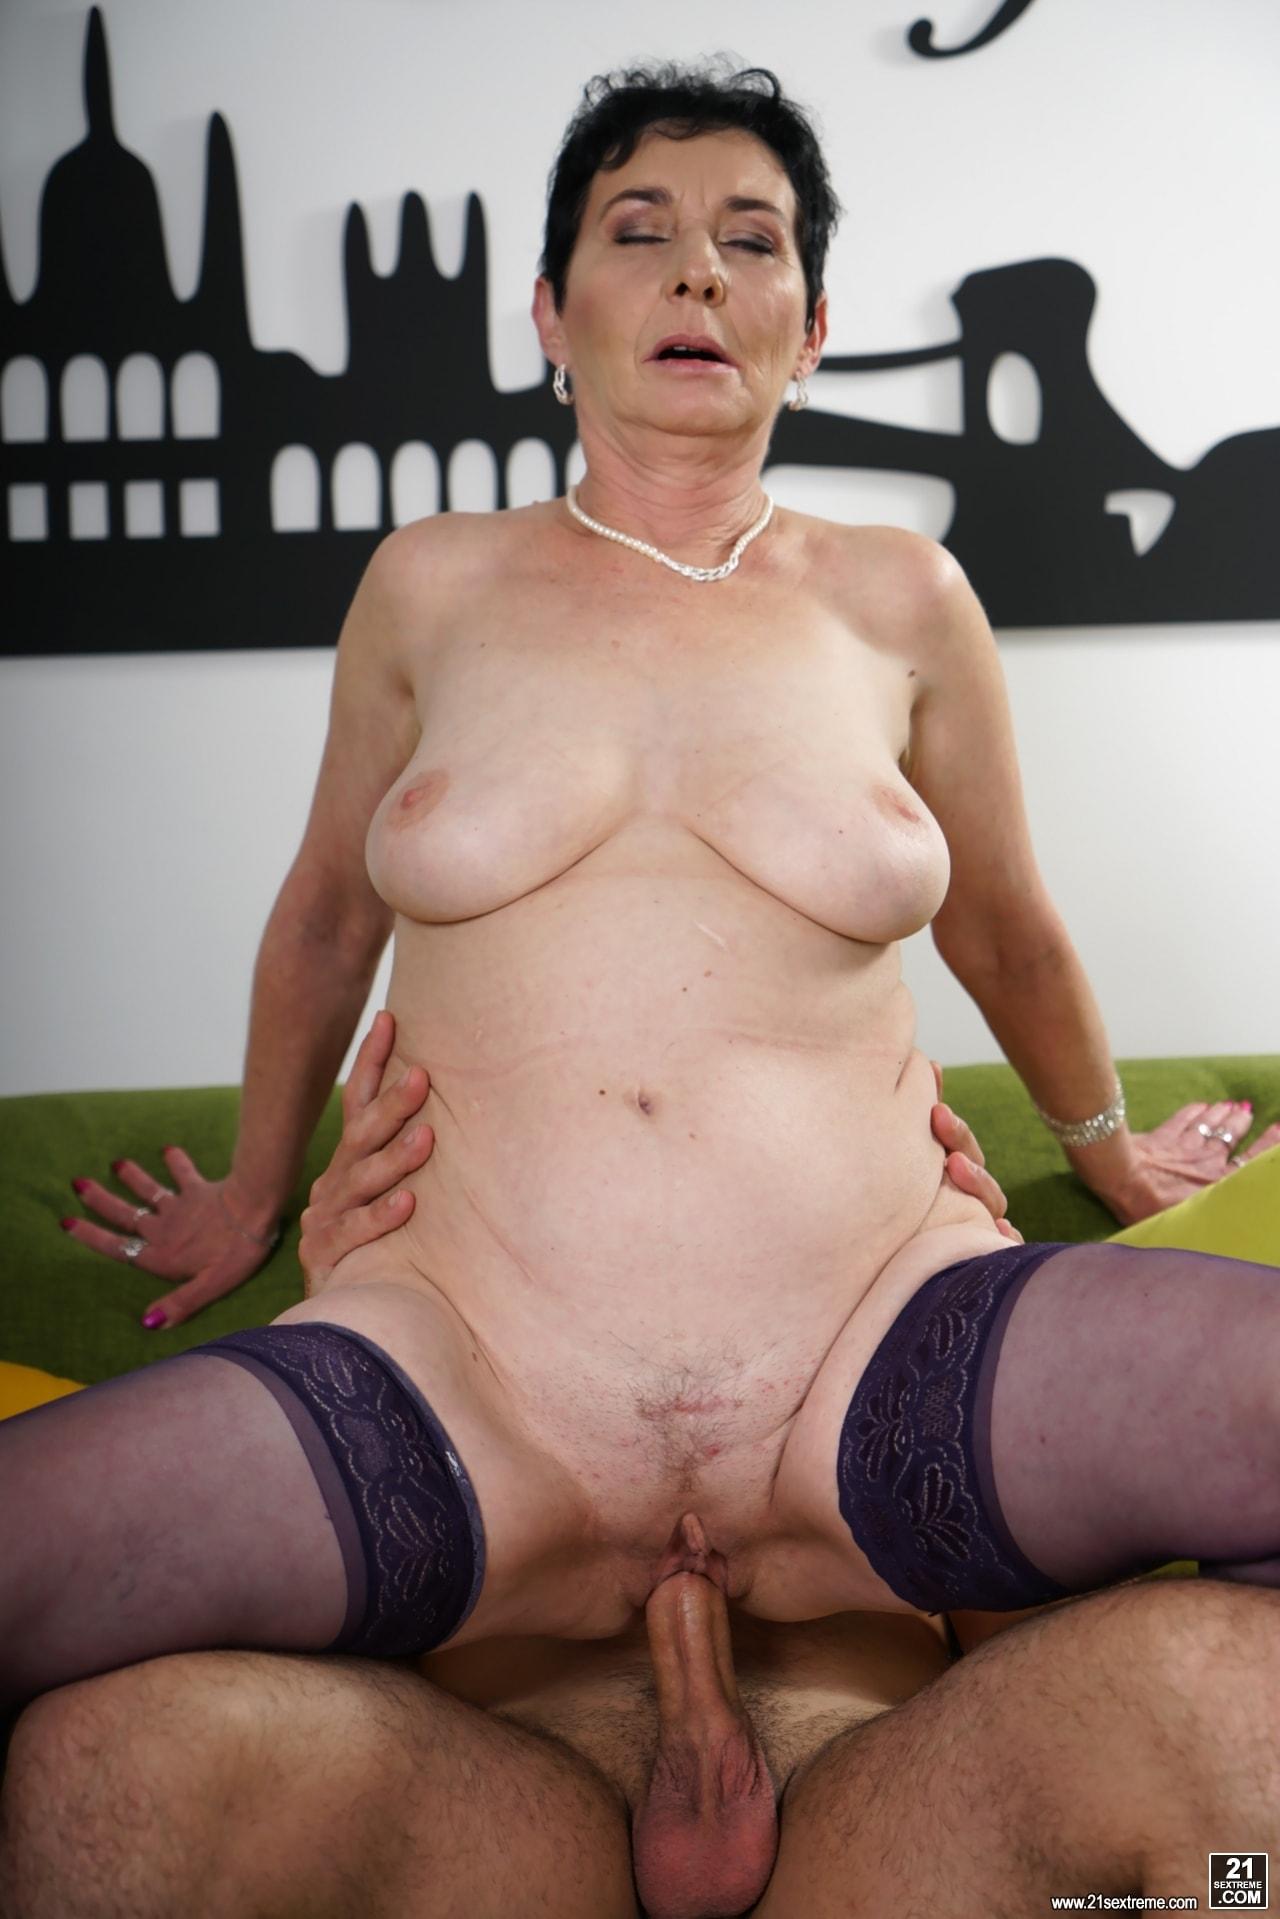 21Sextury 'Lust For Pixie' starring Pixie (Photo 144)